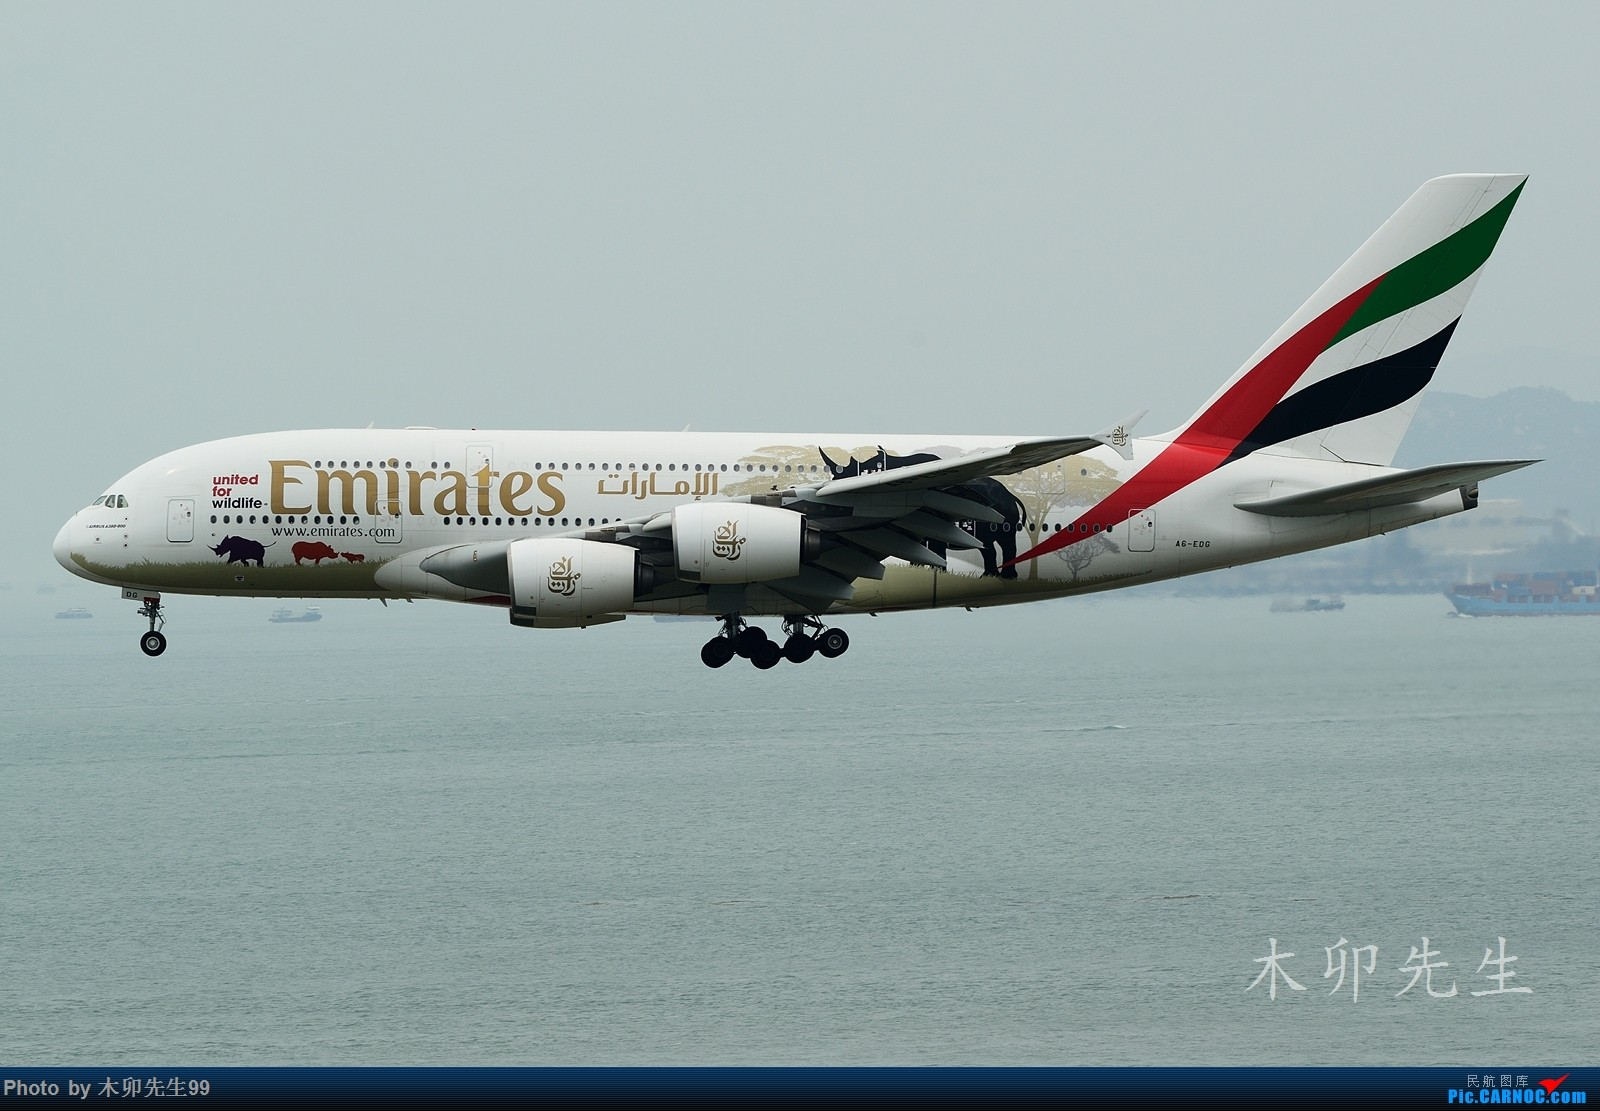 Re:[原创]【木卯先生99】—【世界最大A380彩绘机之一犀牛——阿聯酋航空】—2016—006 AIRBUS A380 A6-EDG 香港赤鱲角国际机场